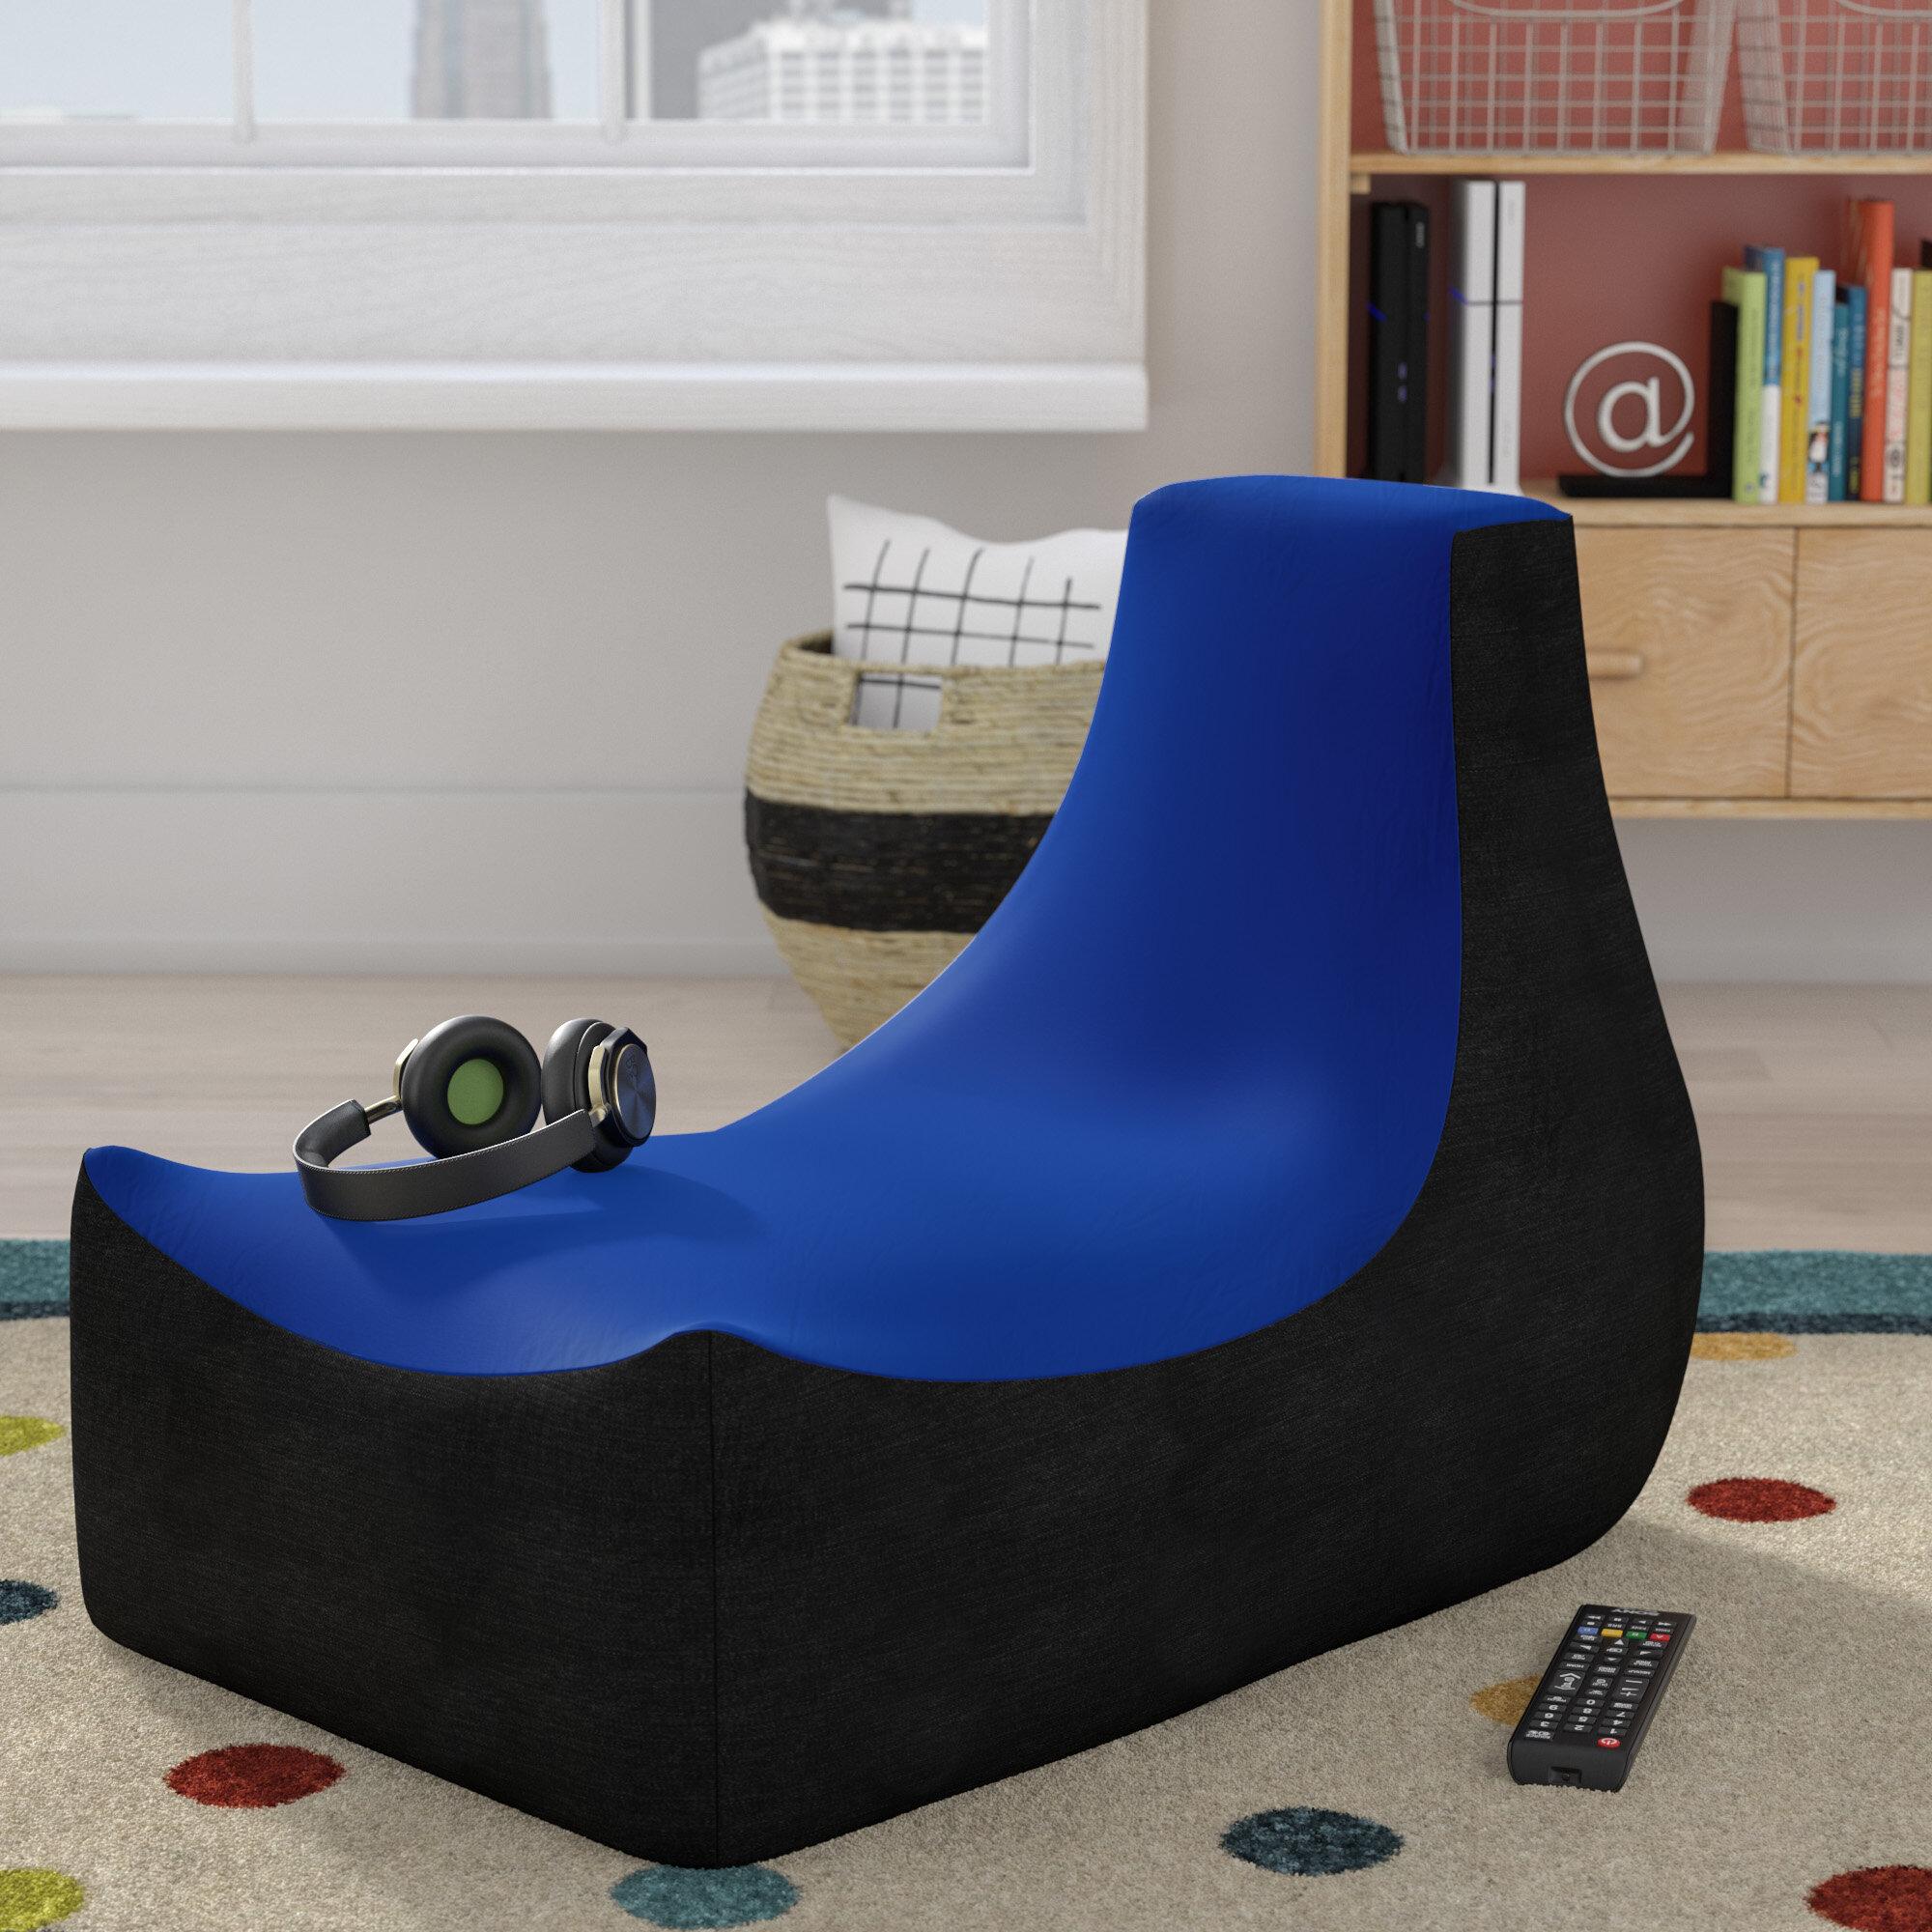 bean bag gaming chair Viv + Rae Bean Bag Gaming Chair & Reviews | Wayfair bean bag gaming chair